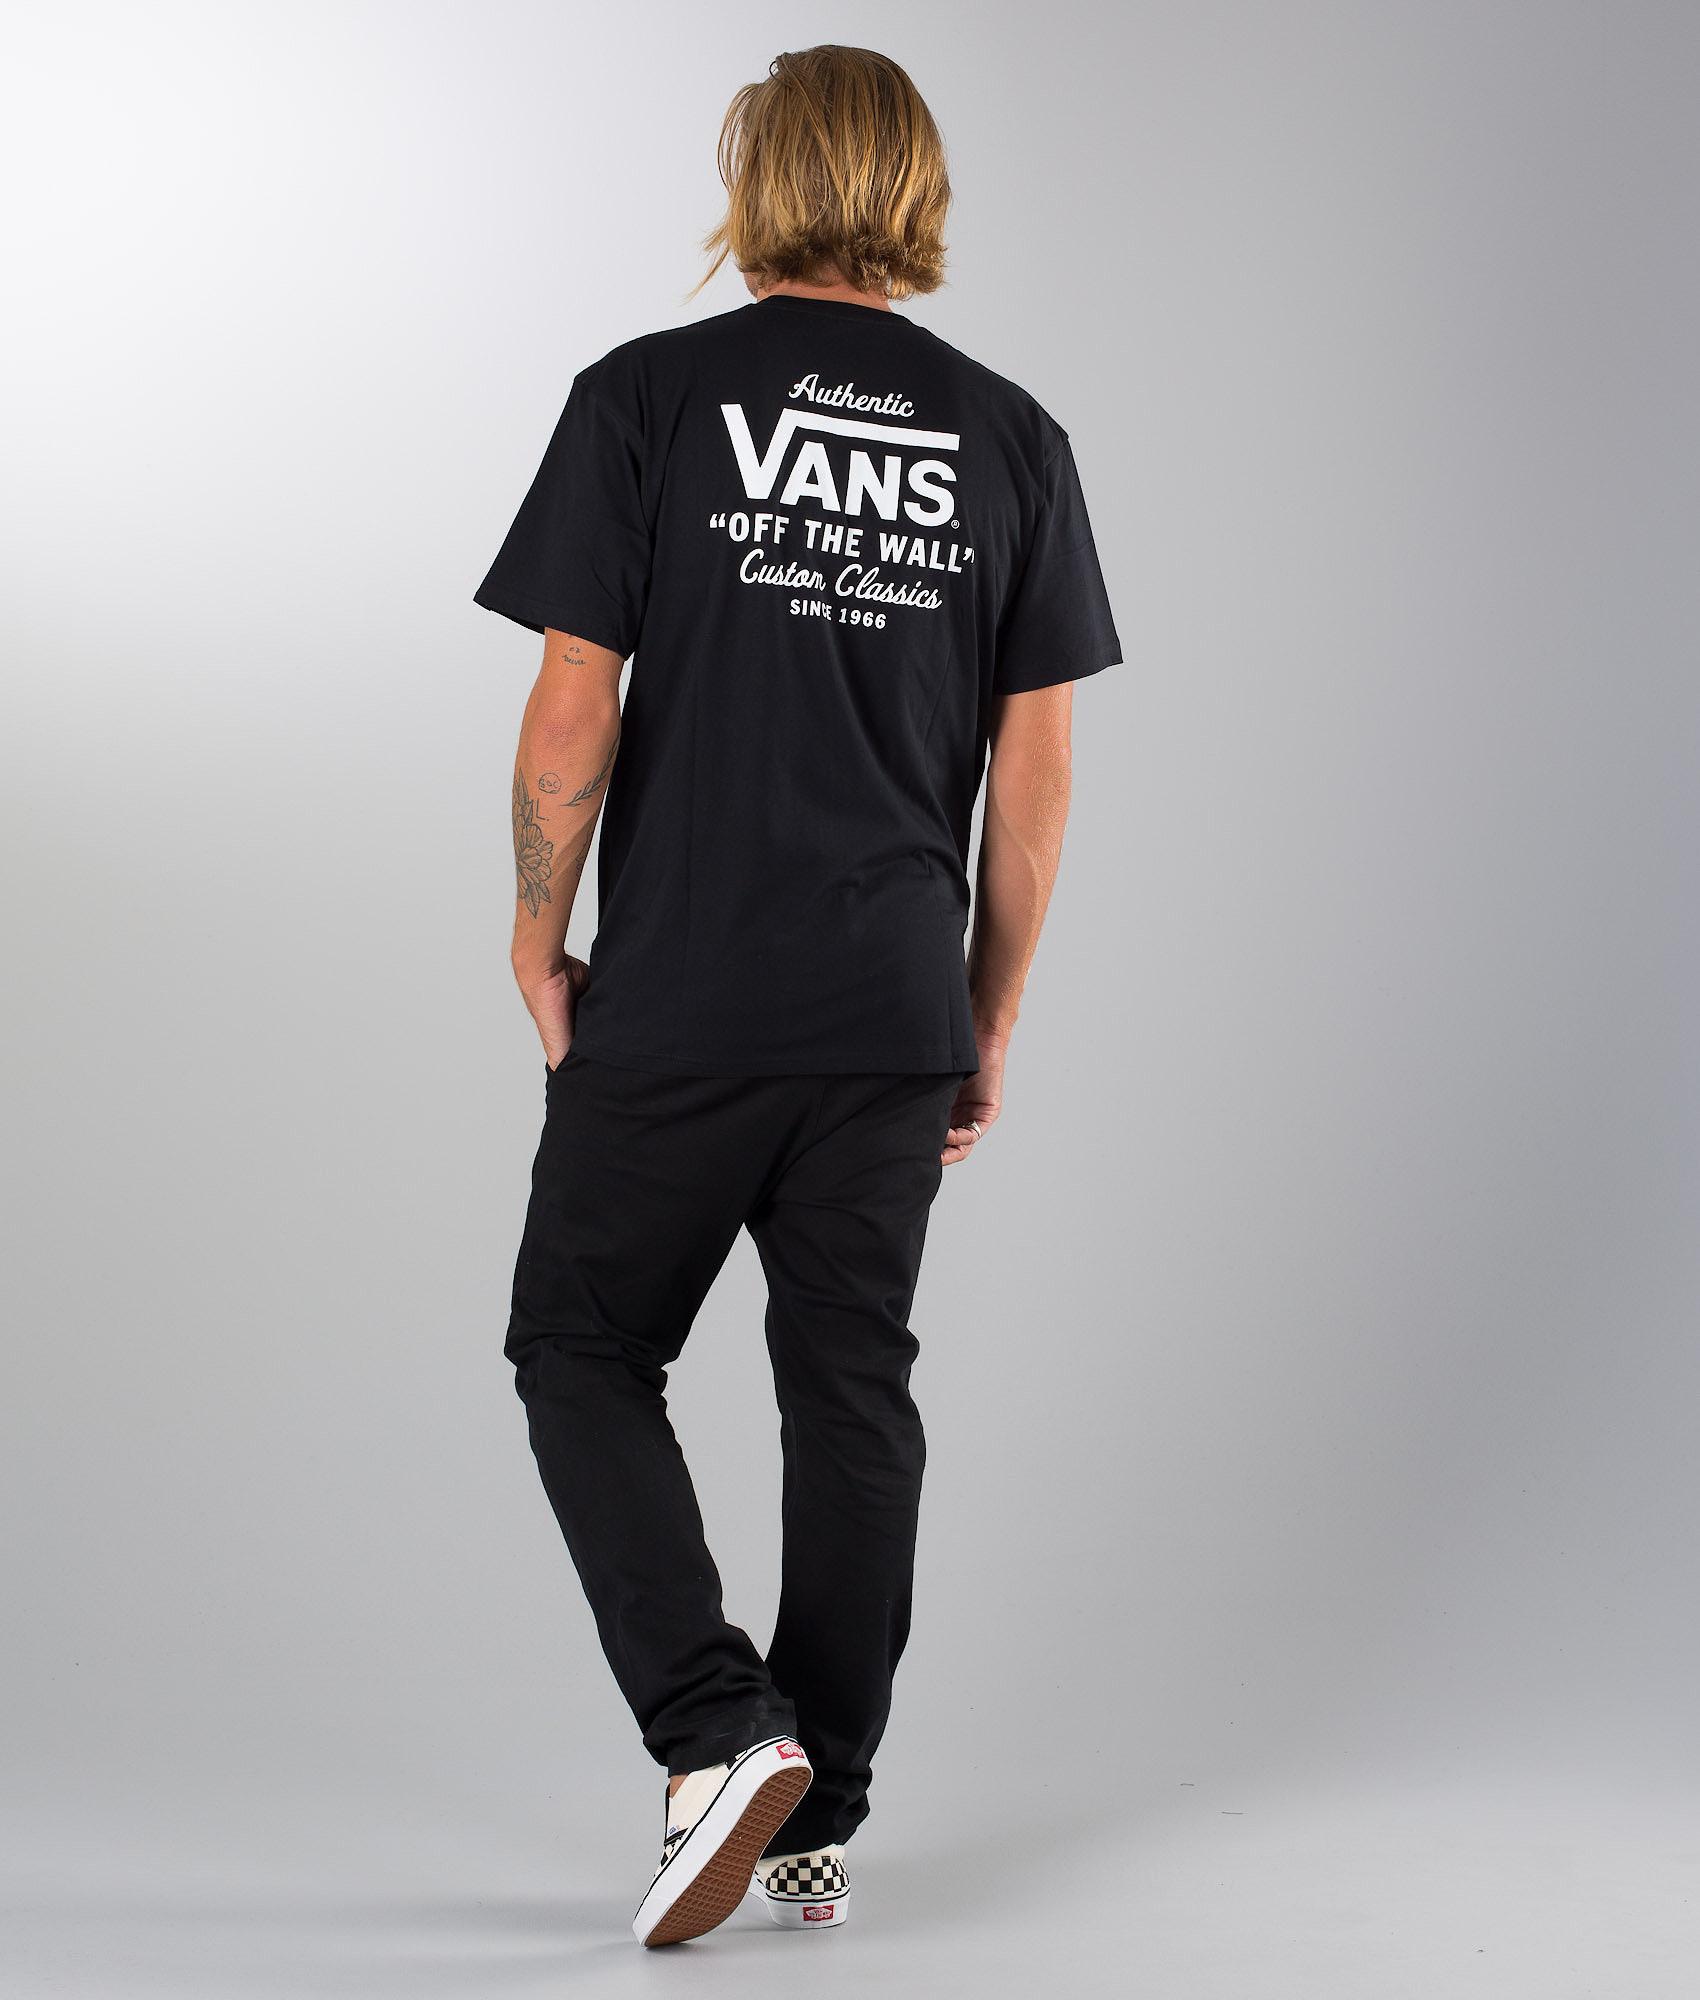 Vans Holder St Classic T-shirt Black - Ridestore.com 5723ee6072